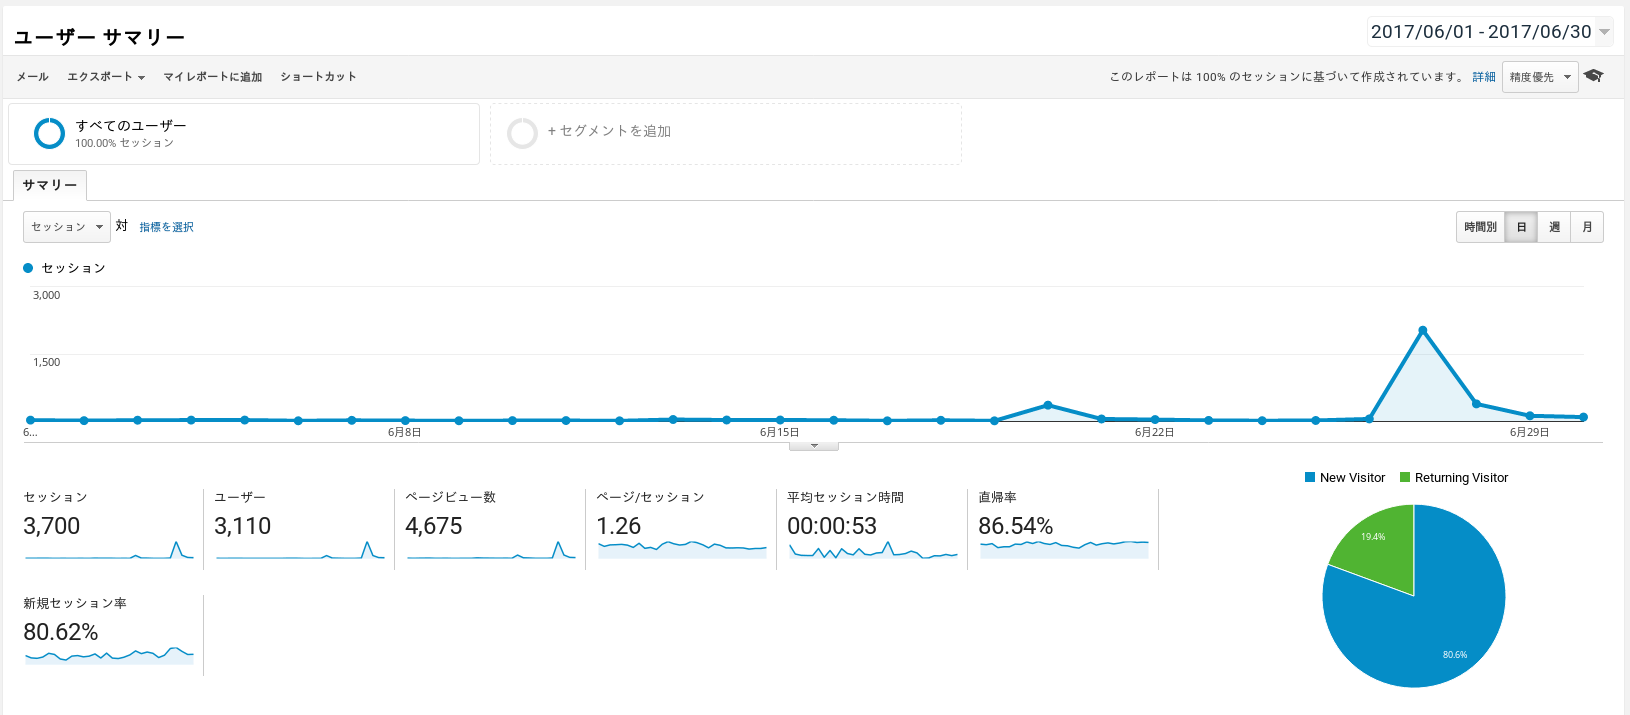 Koipun Google Analytics Dashboard